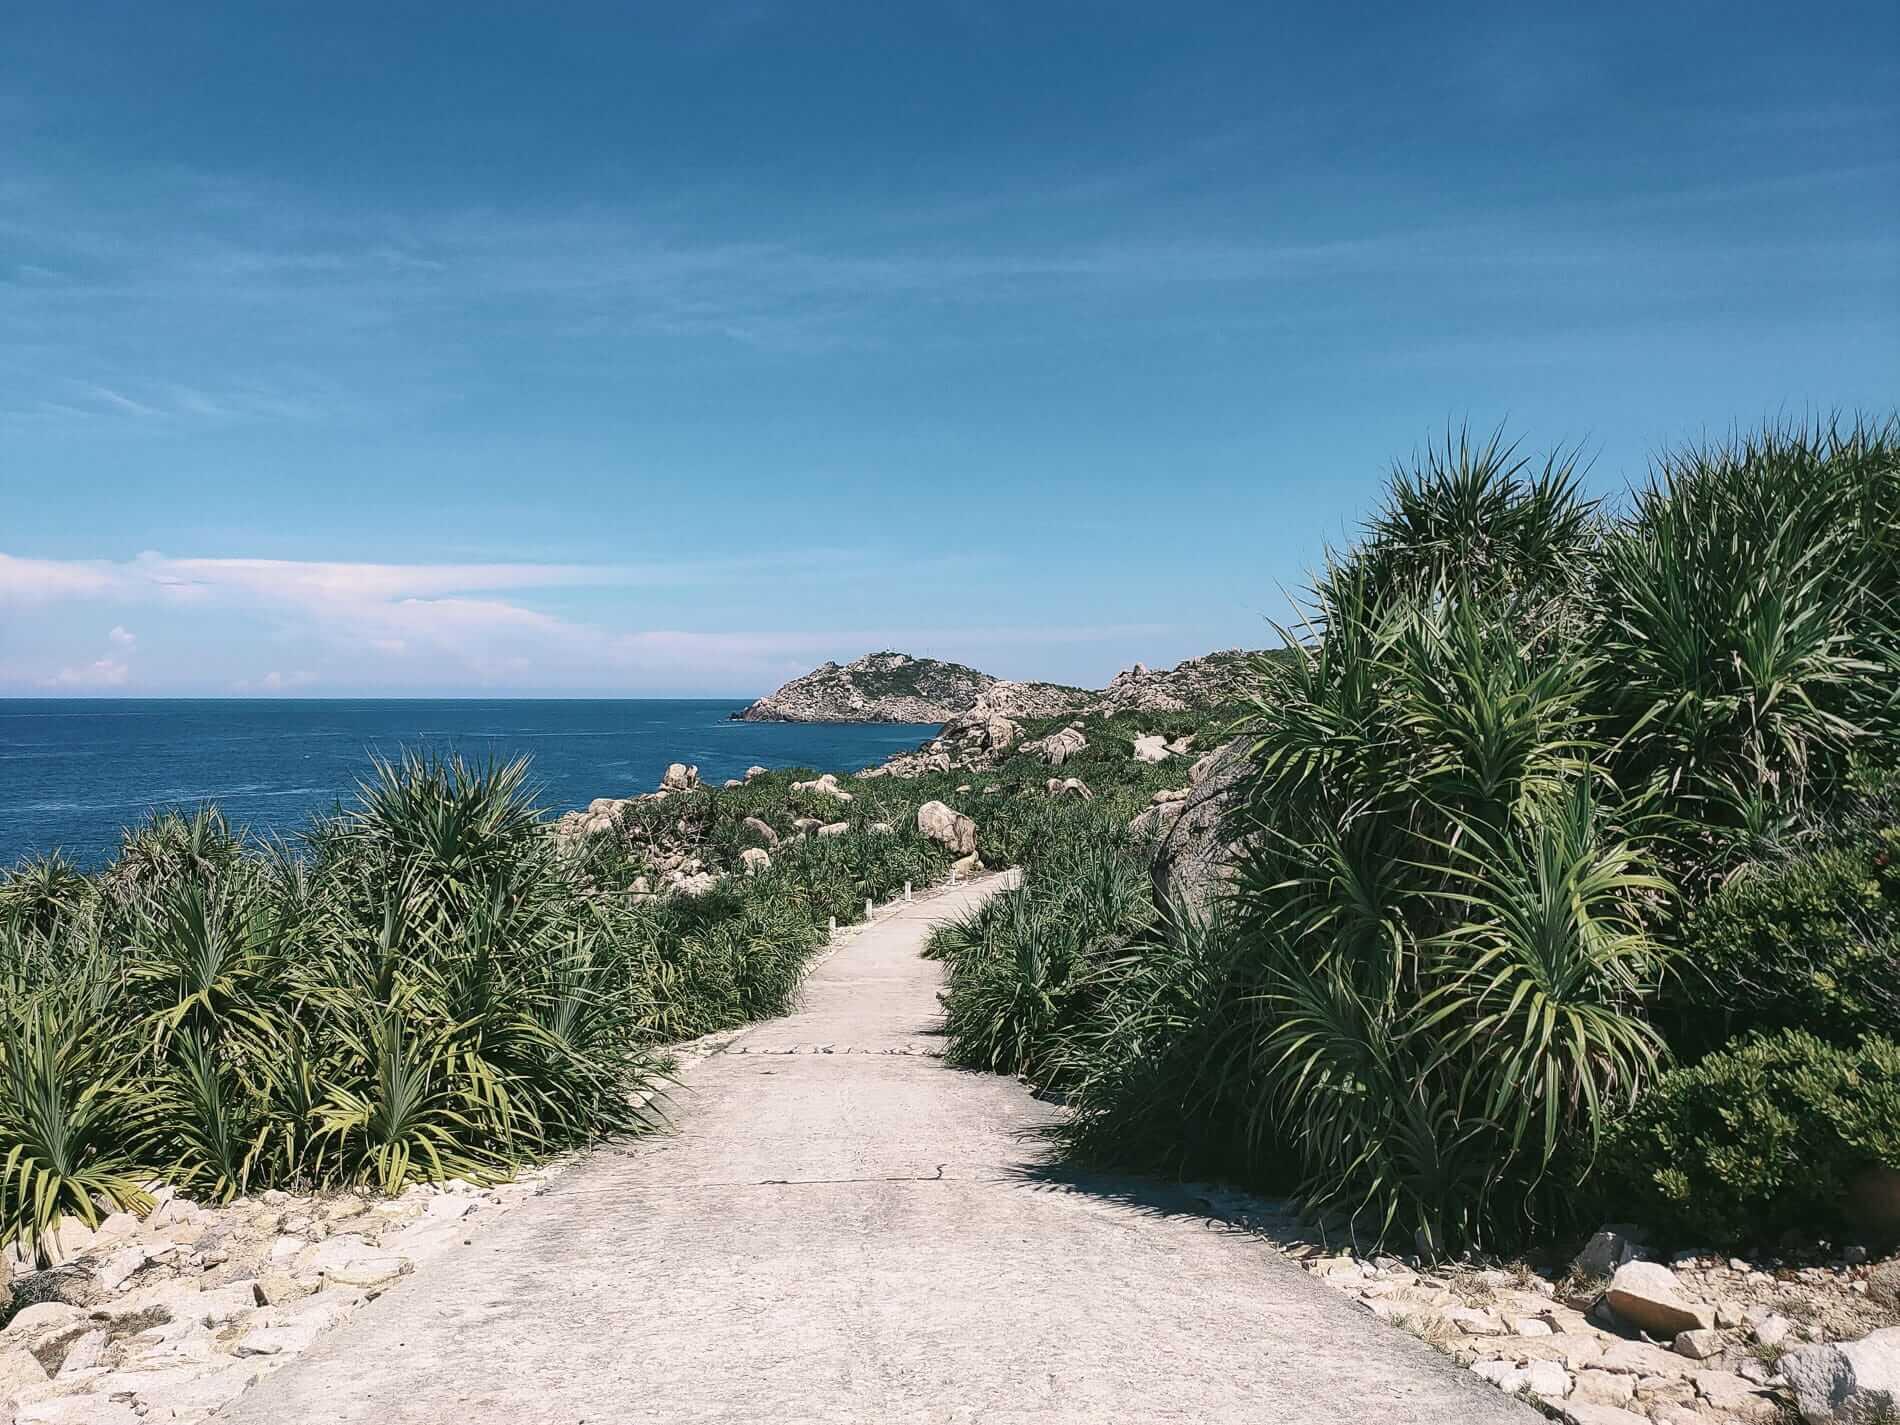 A small coast road - Hoi An to Quy Nhon